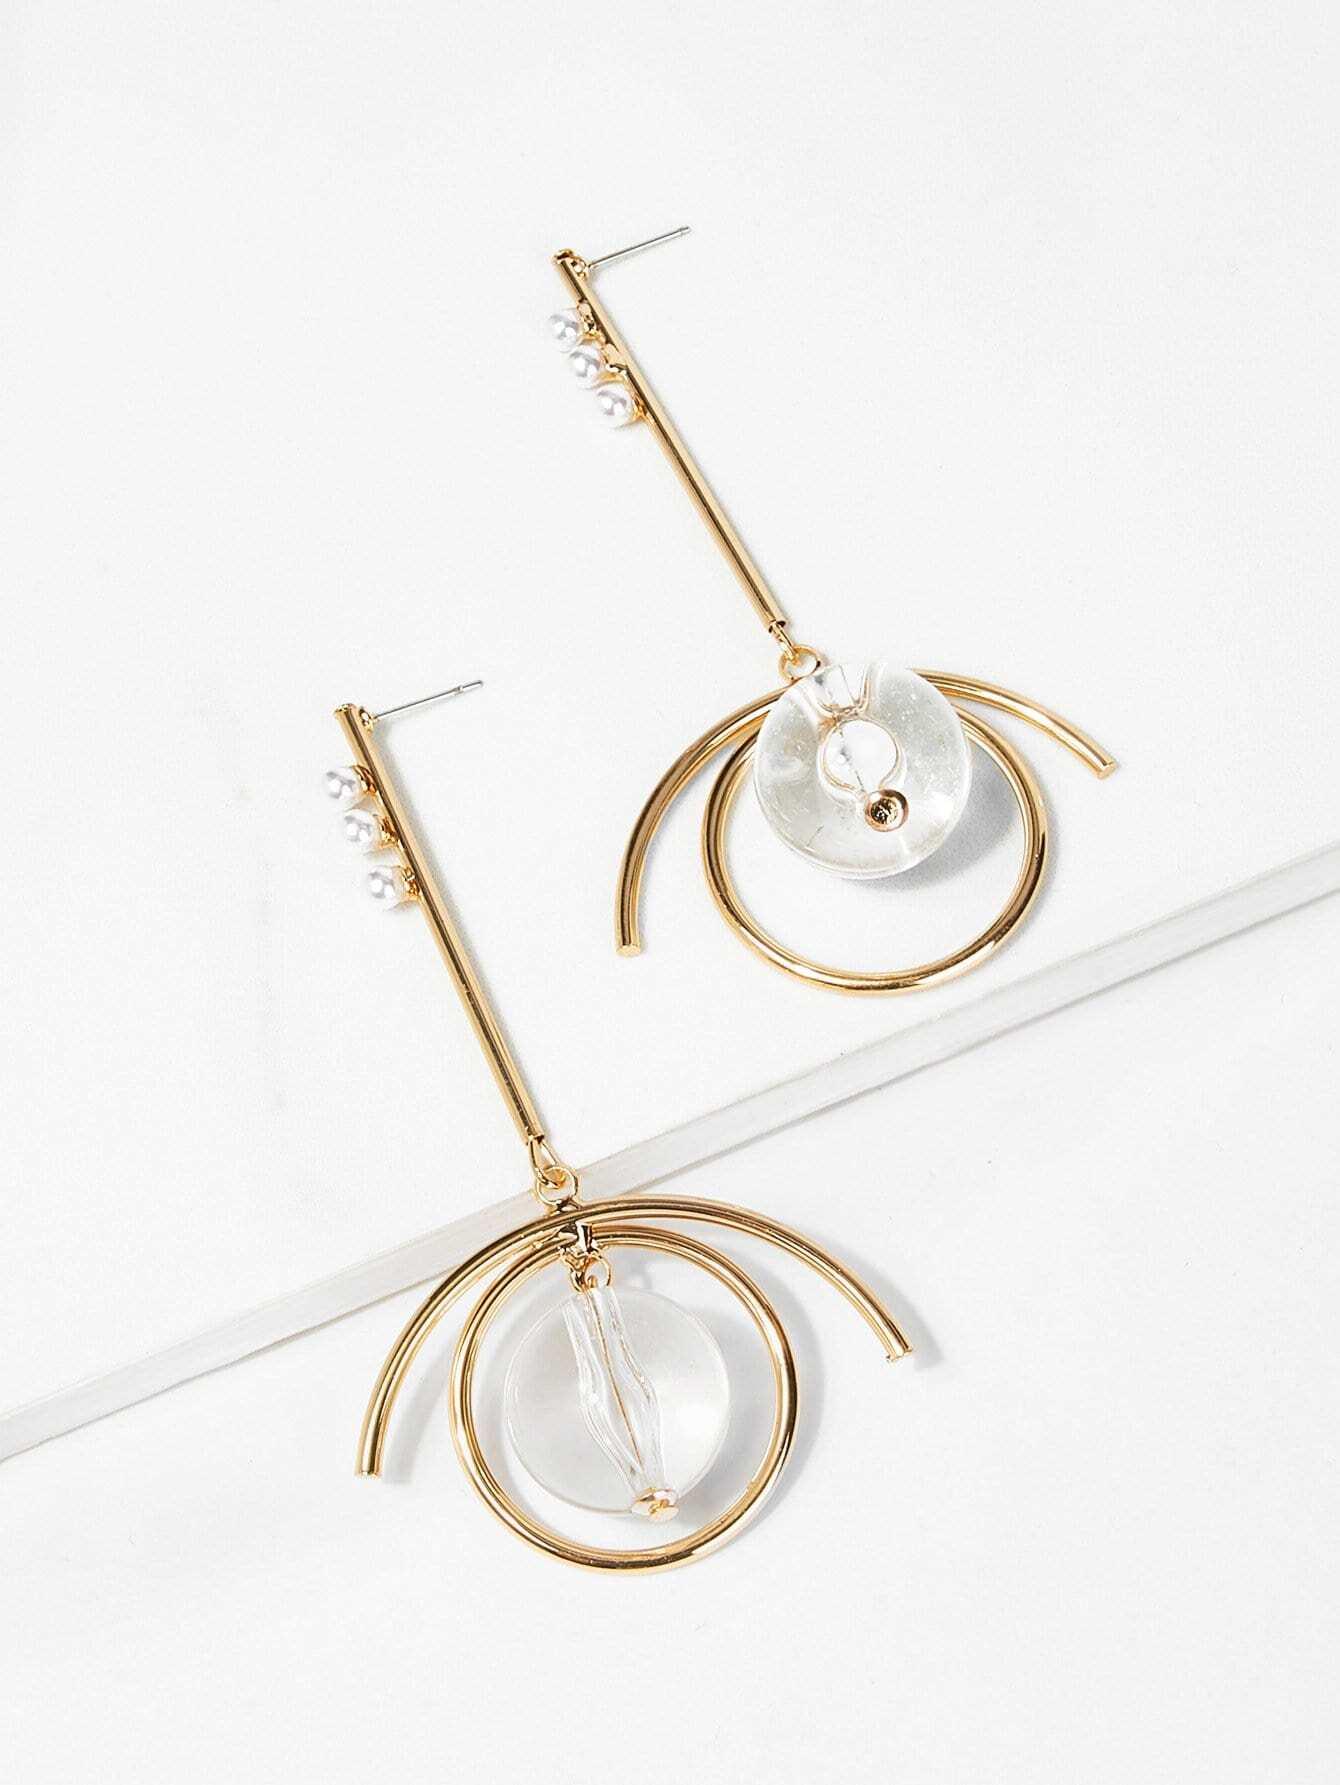 Bar & Ball Design Hoop Drop Earrings silver plated bar dangle drop earrings